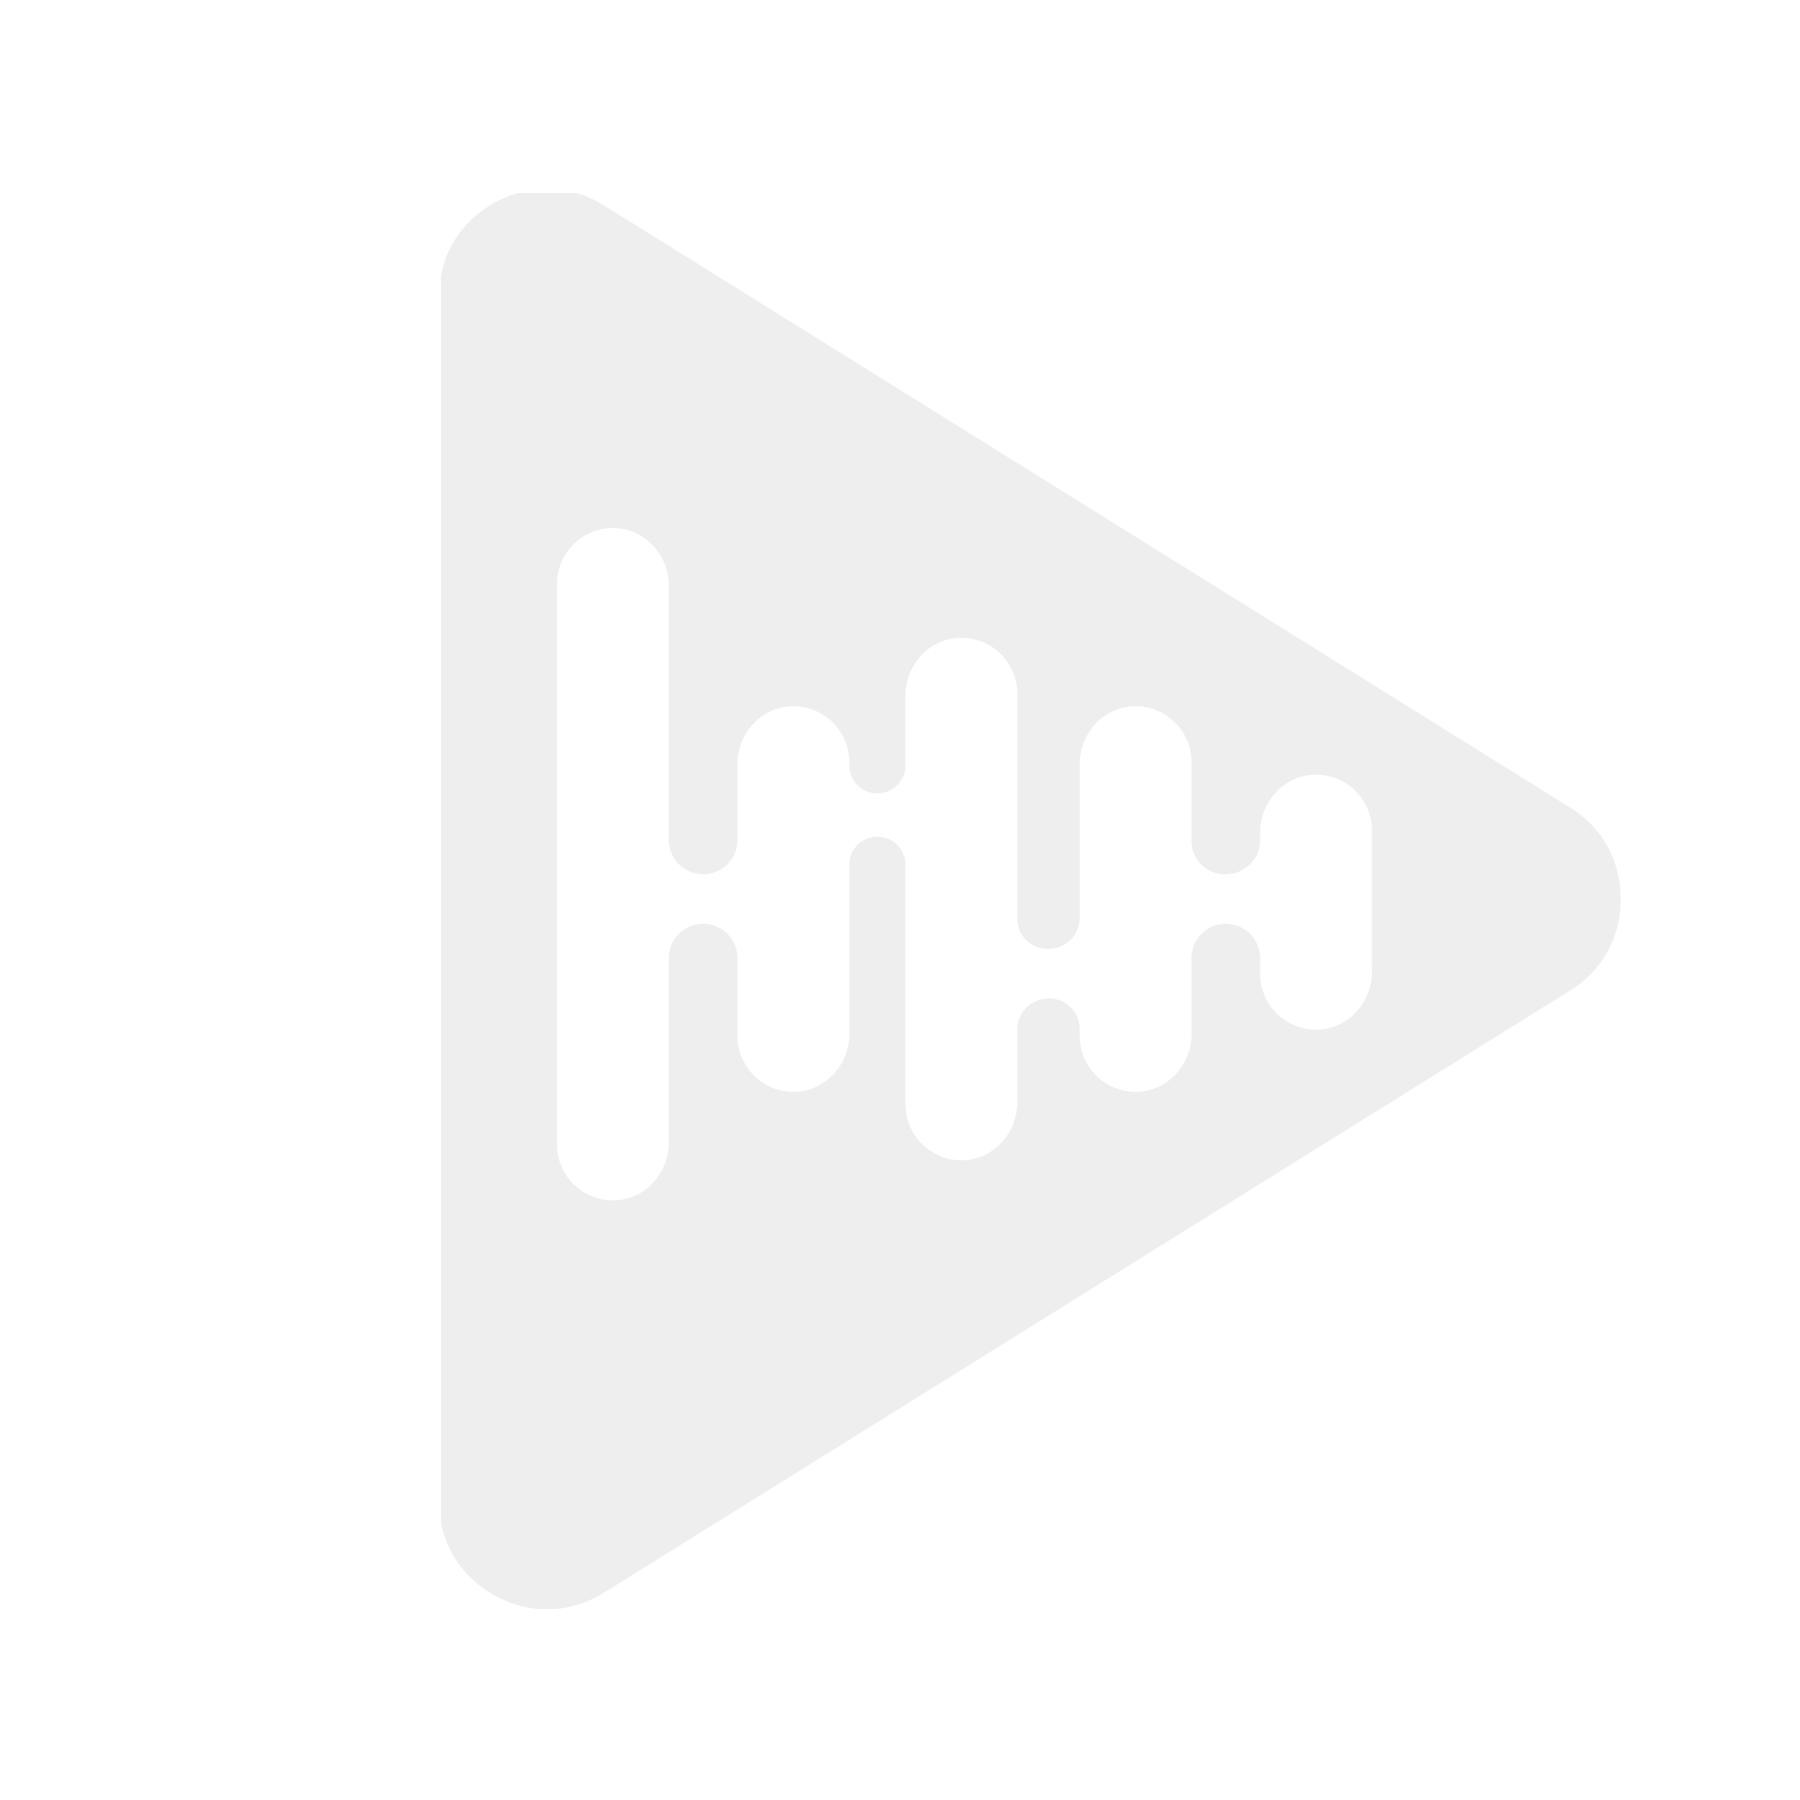 PSB Imagine XB - Bokhyllehøyttaler, sort ask (Par)